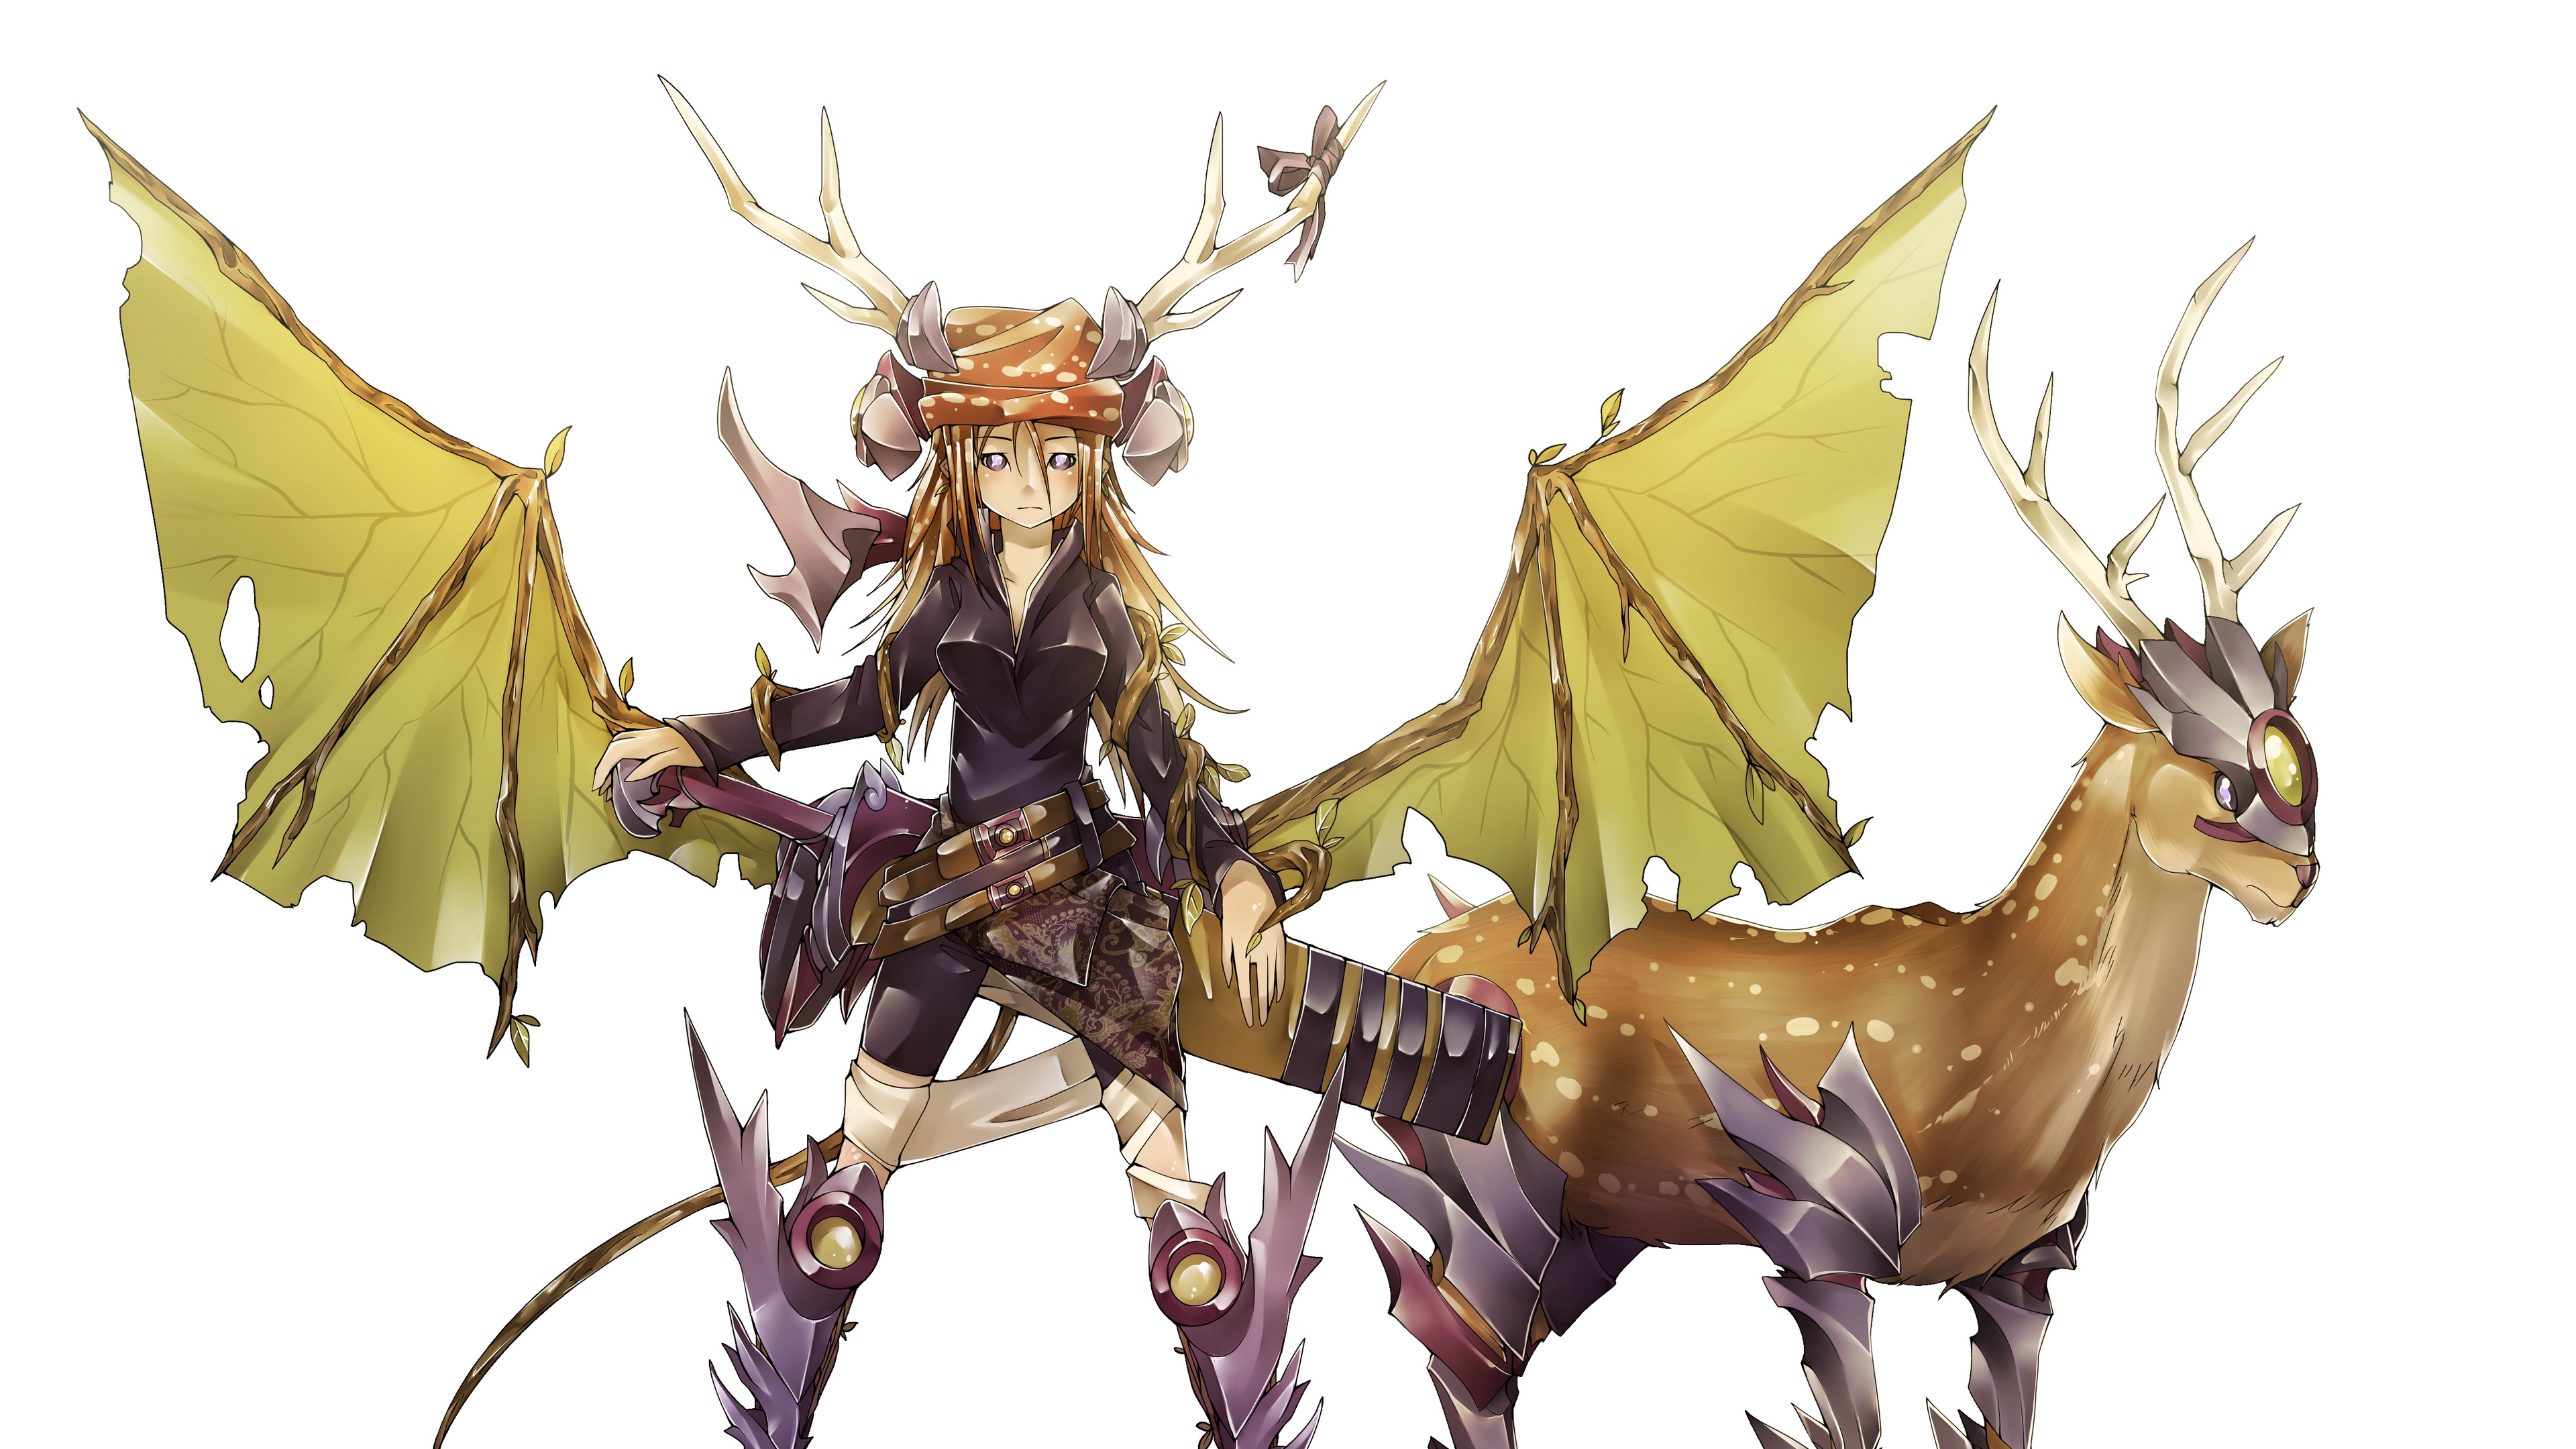 inheritage boundary of existence girl deer horns armor 4k 1541975826 - inheritage, boundary of existence, girl, deer, horns, armor 4k - inheritage, Girl, boundary of existence